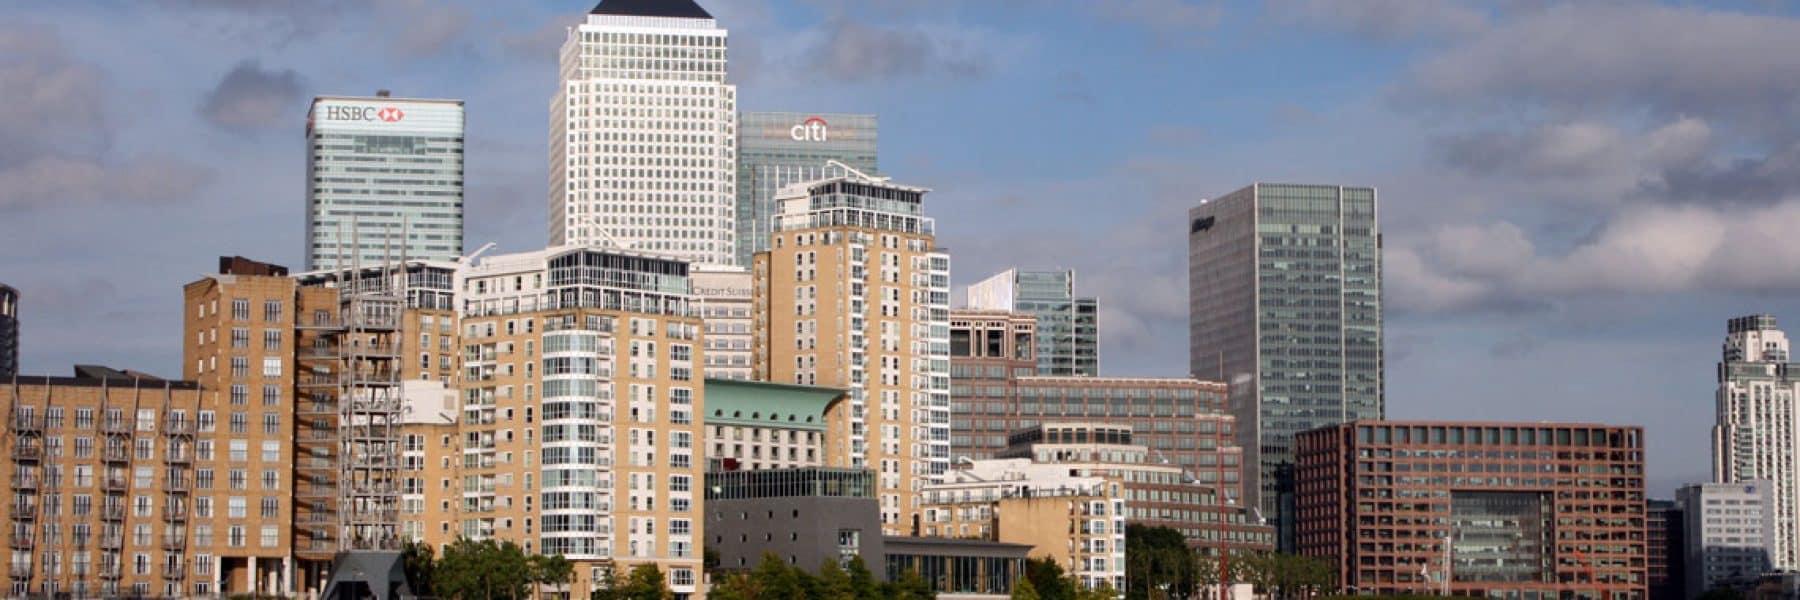 Canary Wharf & Docklands